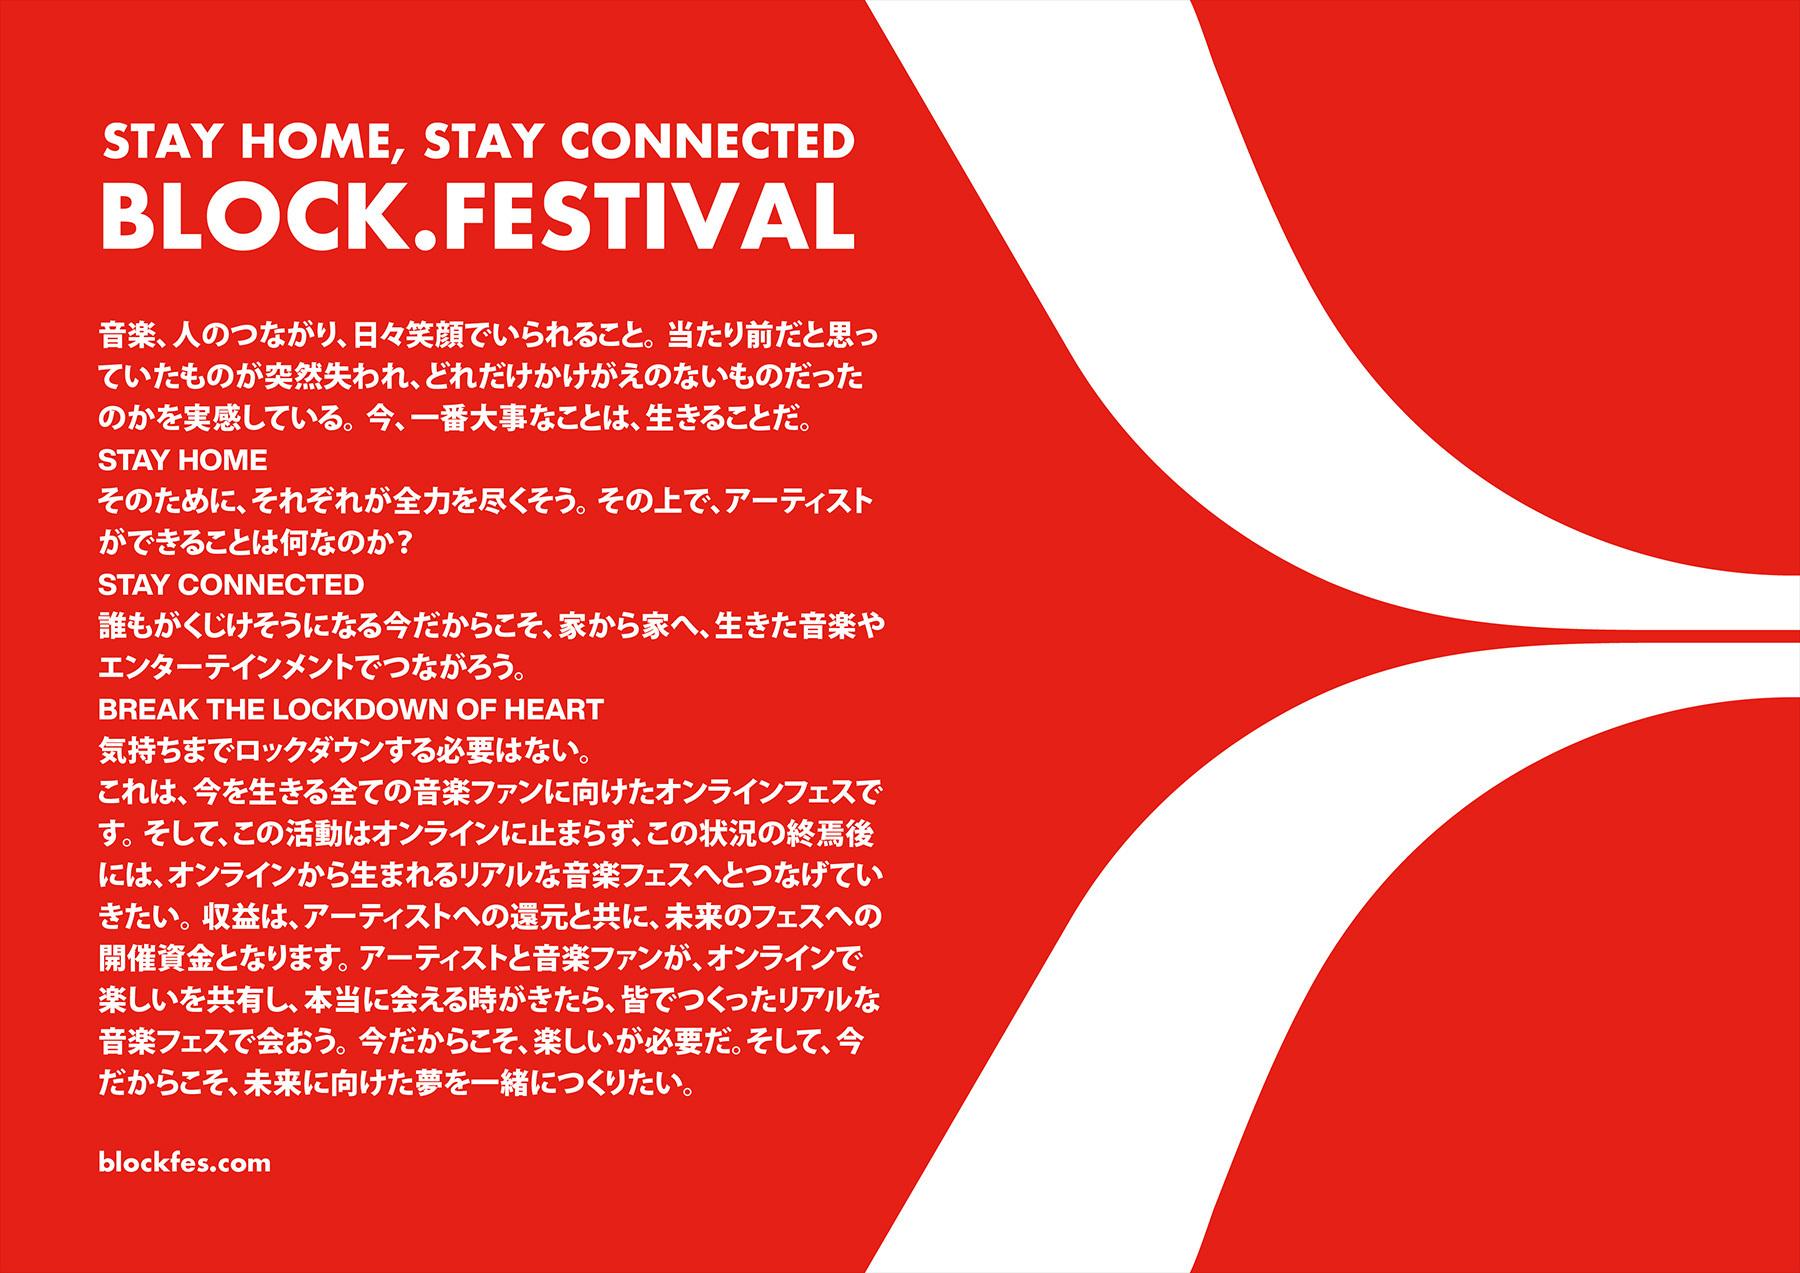 『BLOCK.FESTIVAL』